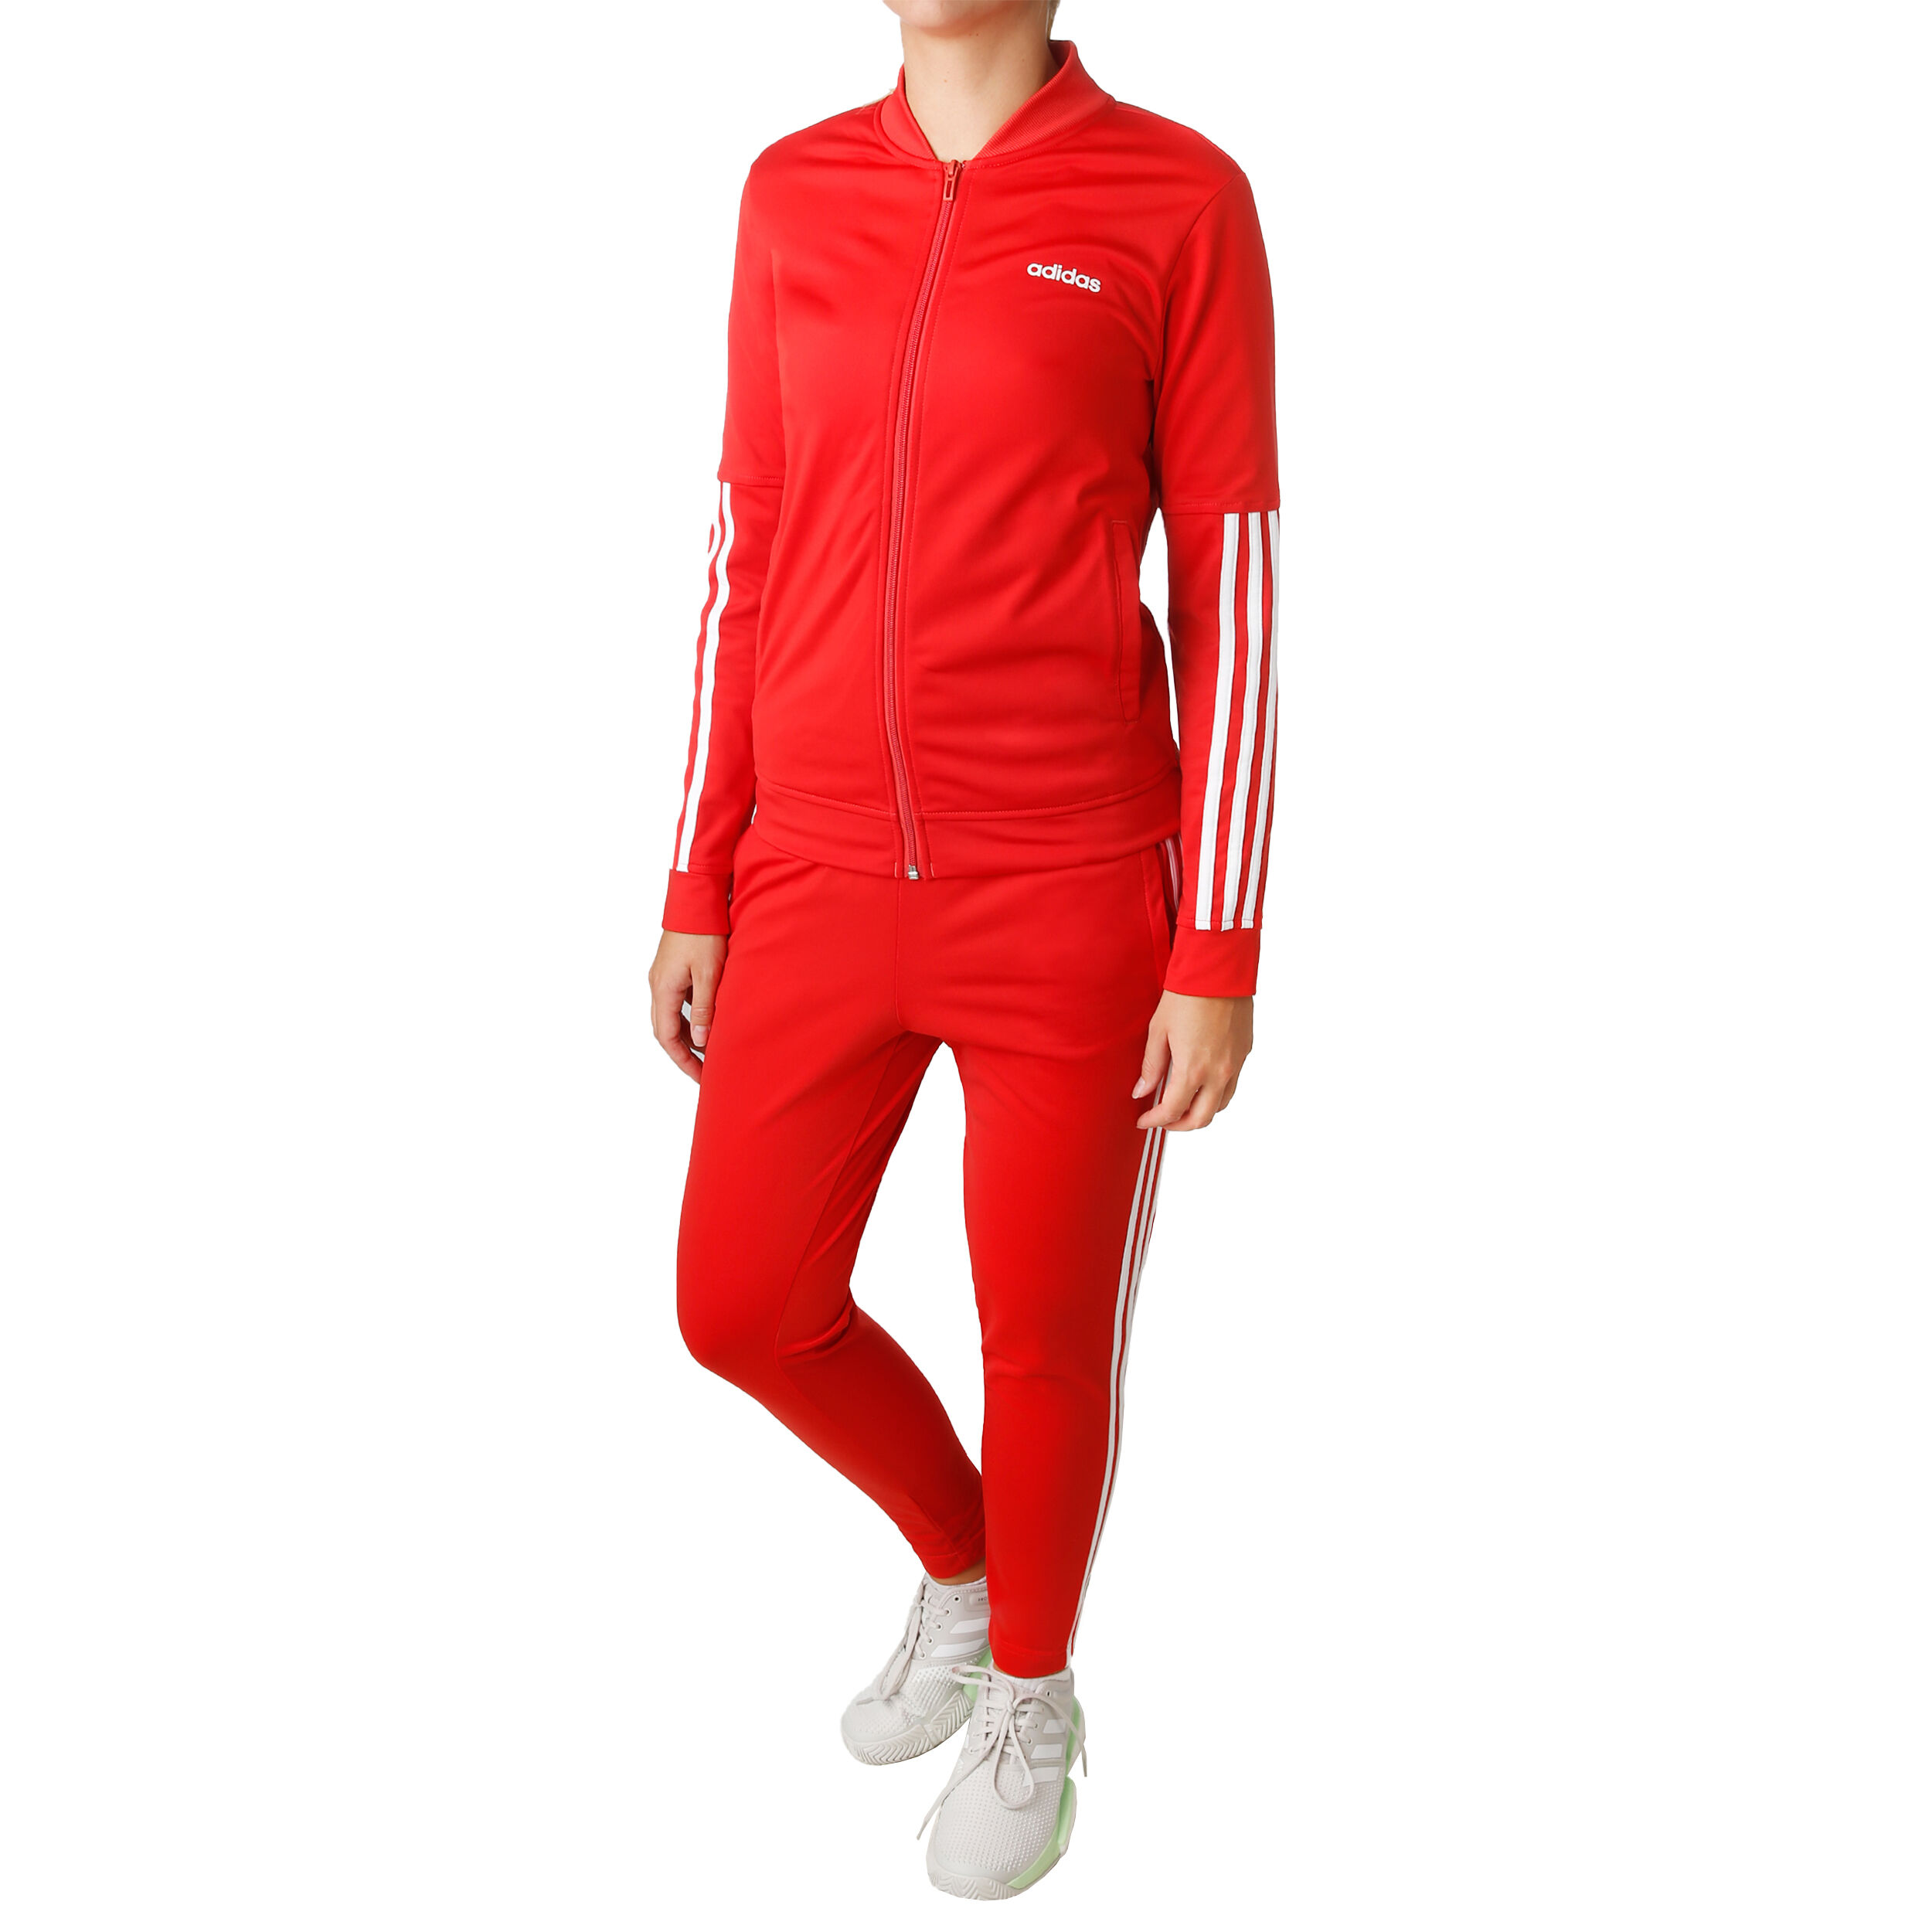 adidas Back2Basic 3 Stripes Trainingsanzug Damen Hellrot